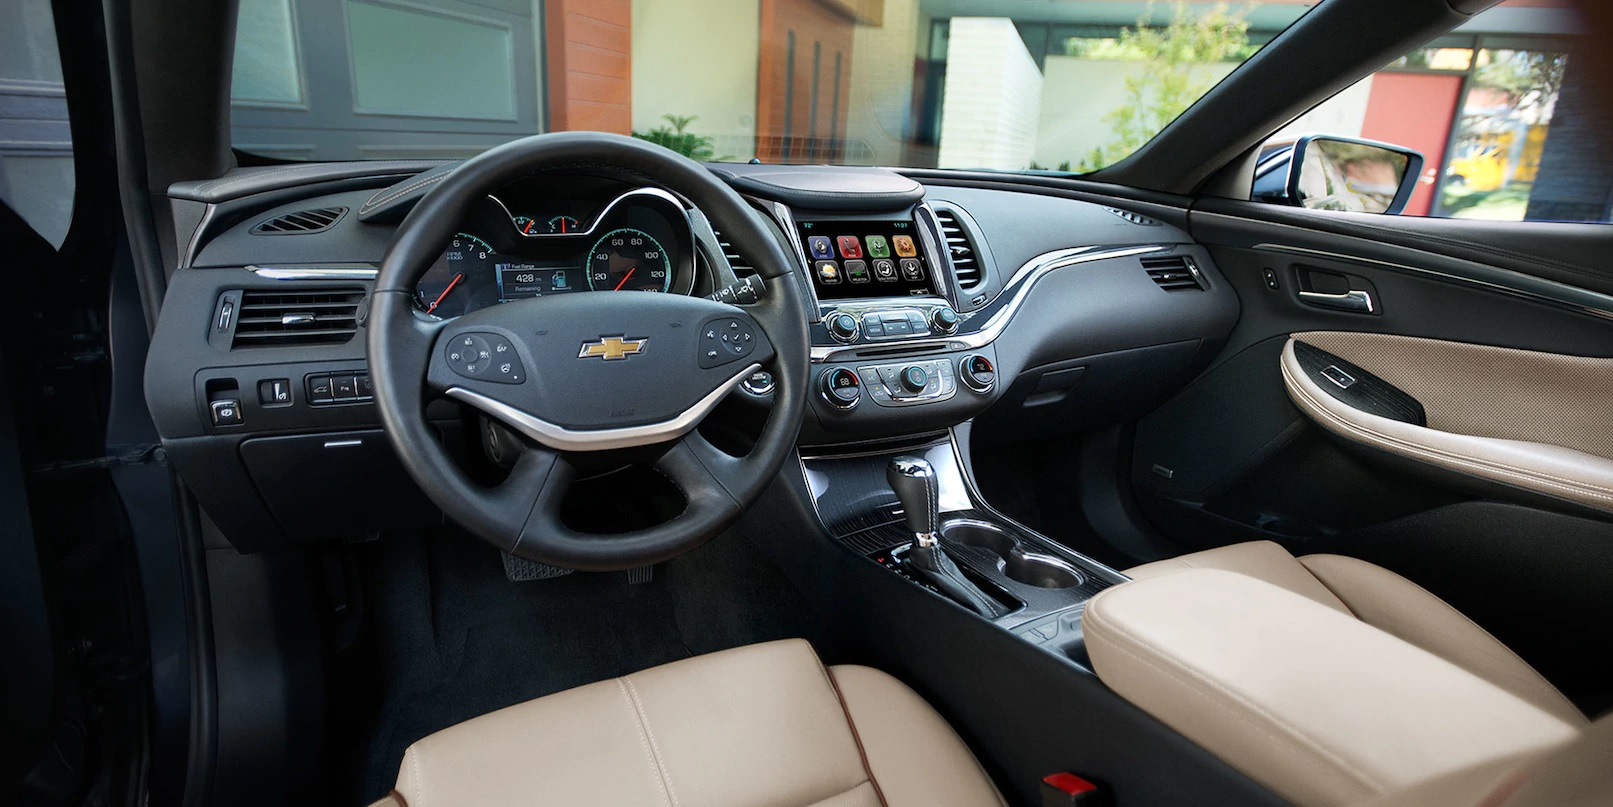 2018 chevrolet impala for sale near valparaiso in christenson 2018 Chevy Silverado interior of the 2018 chevrolet impala